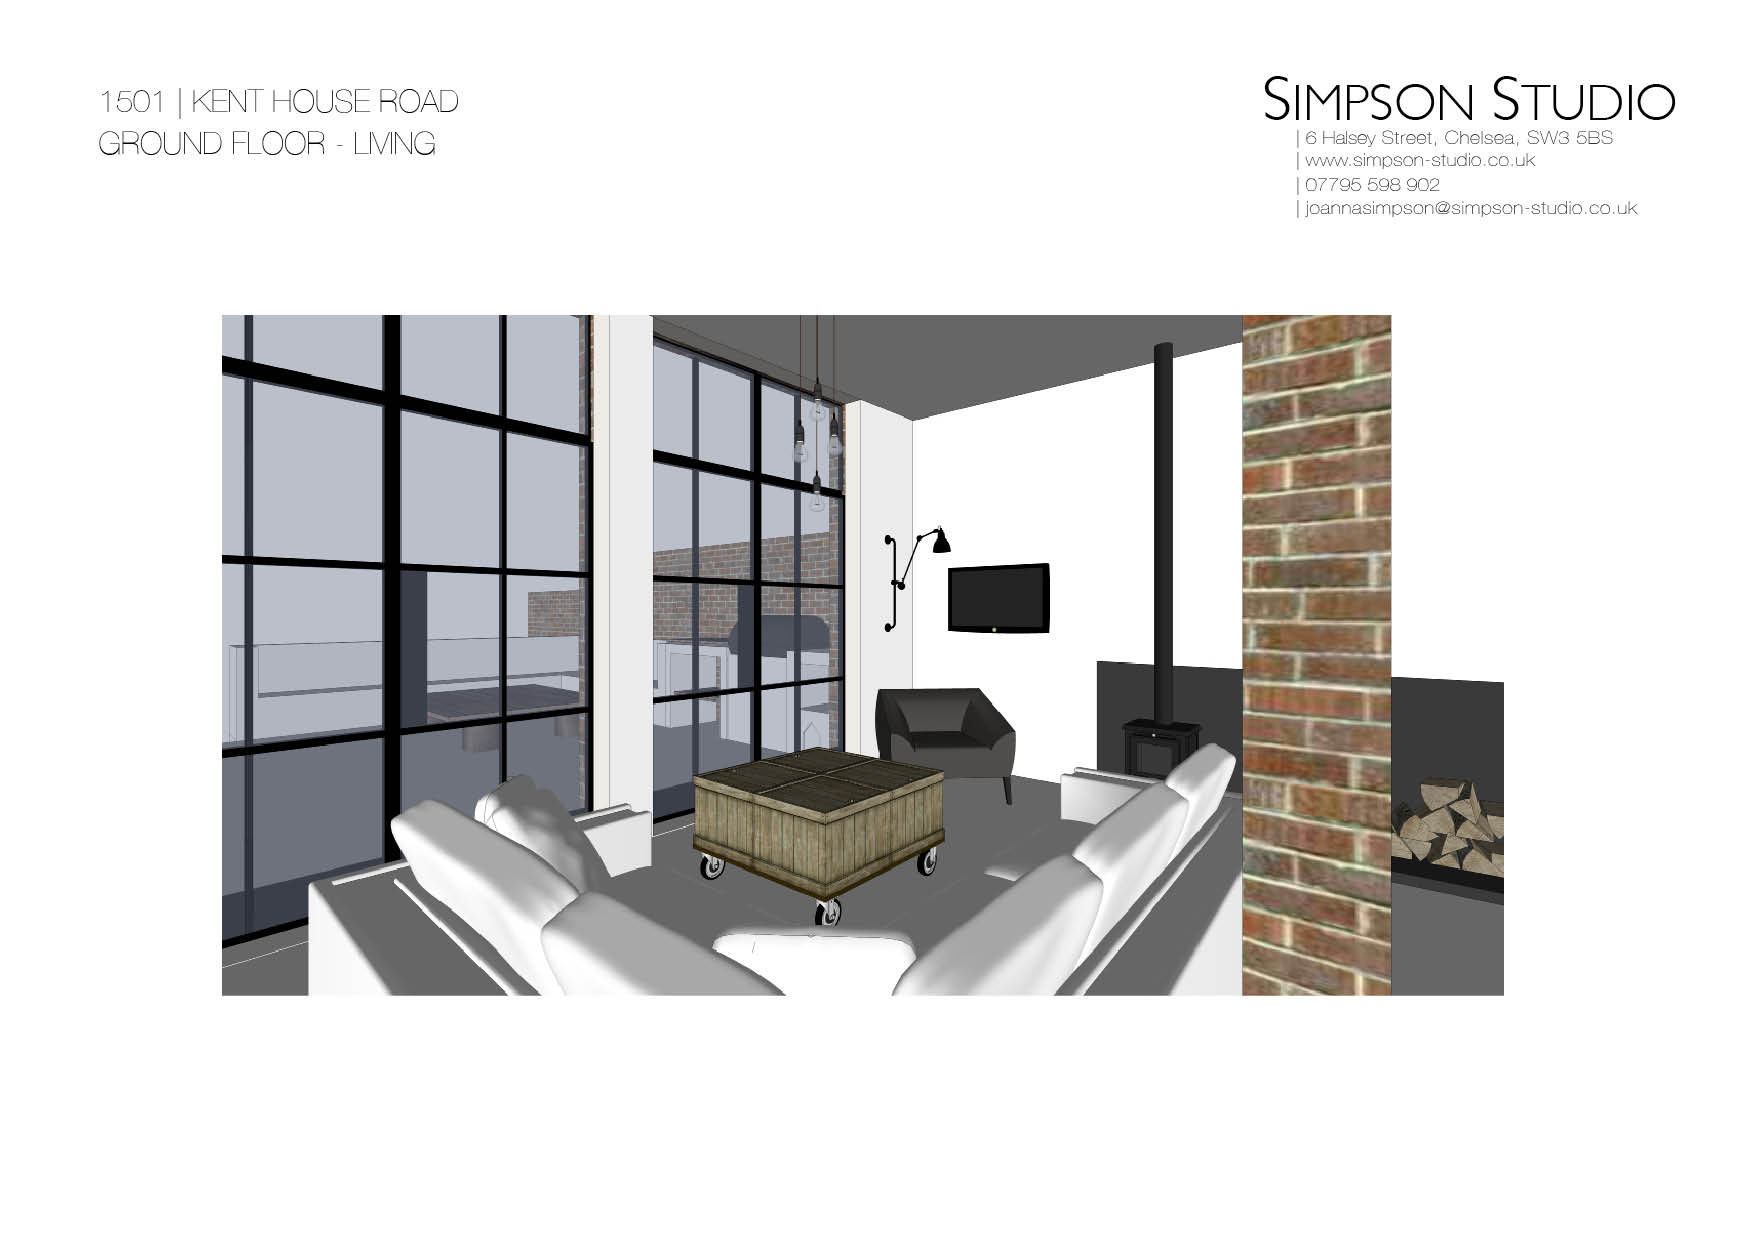 Kent House Road Room Planning15.jpg